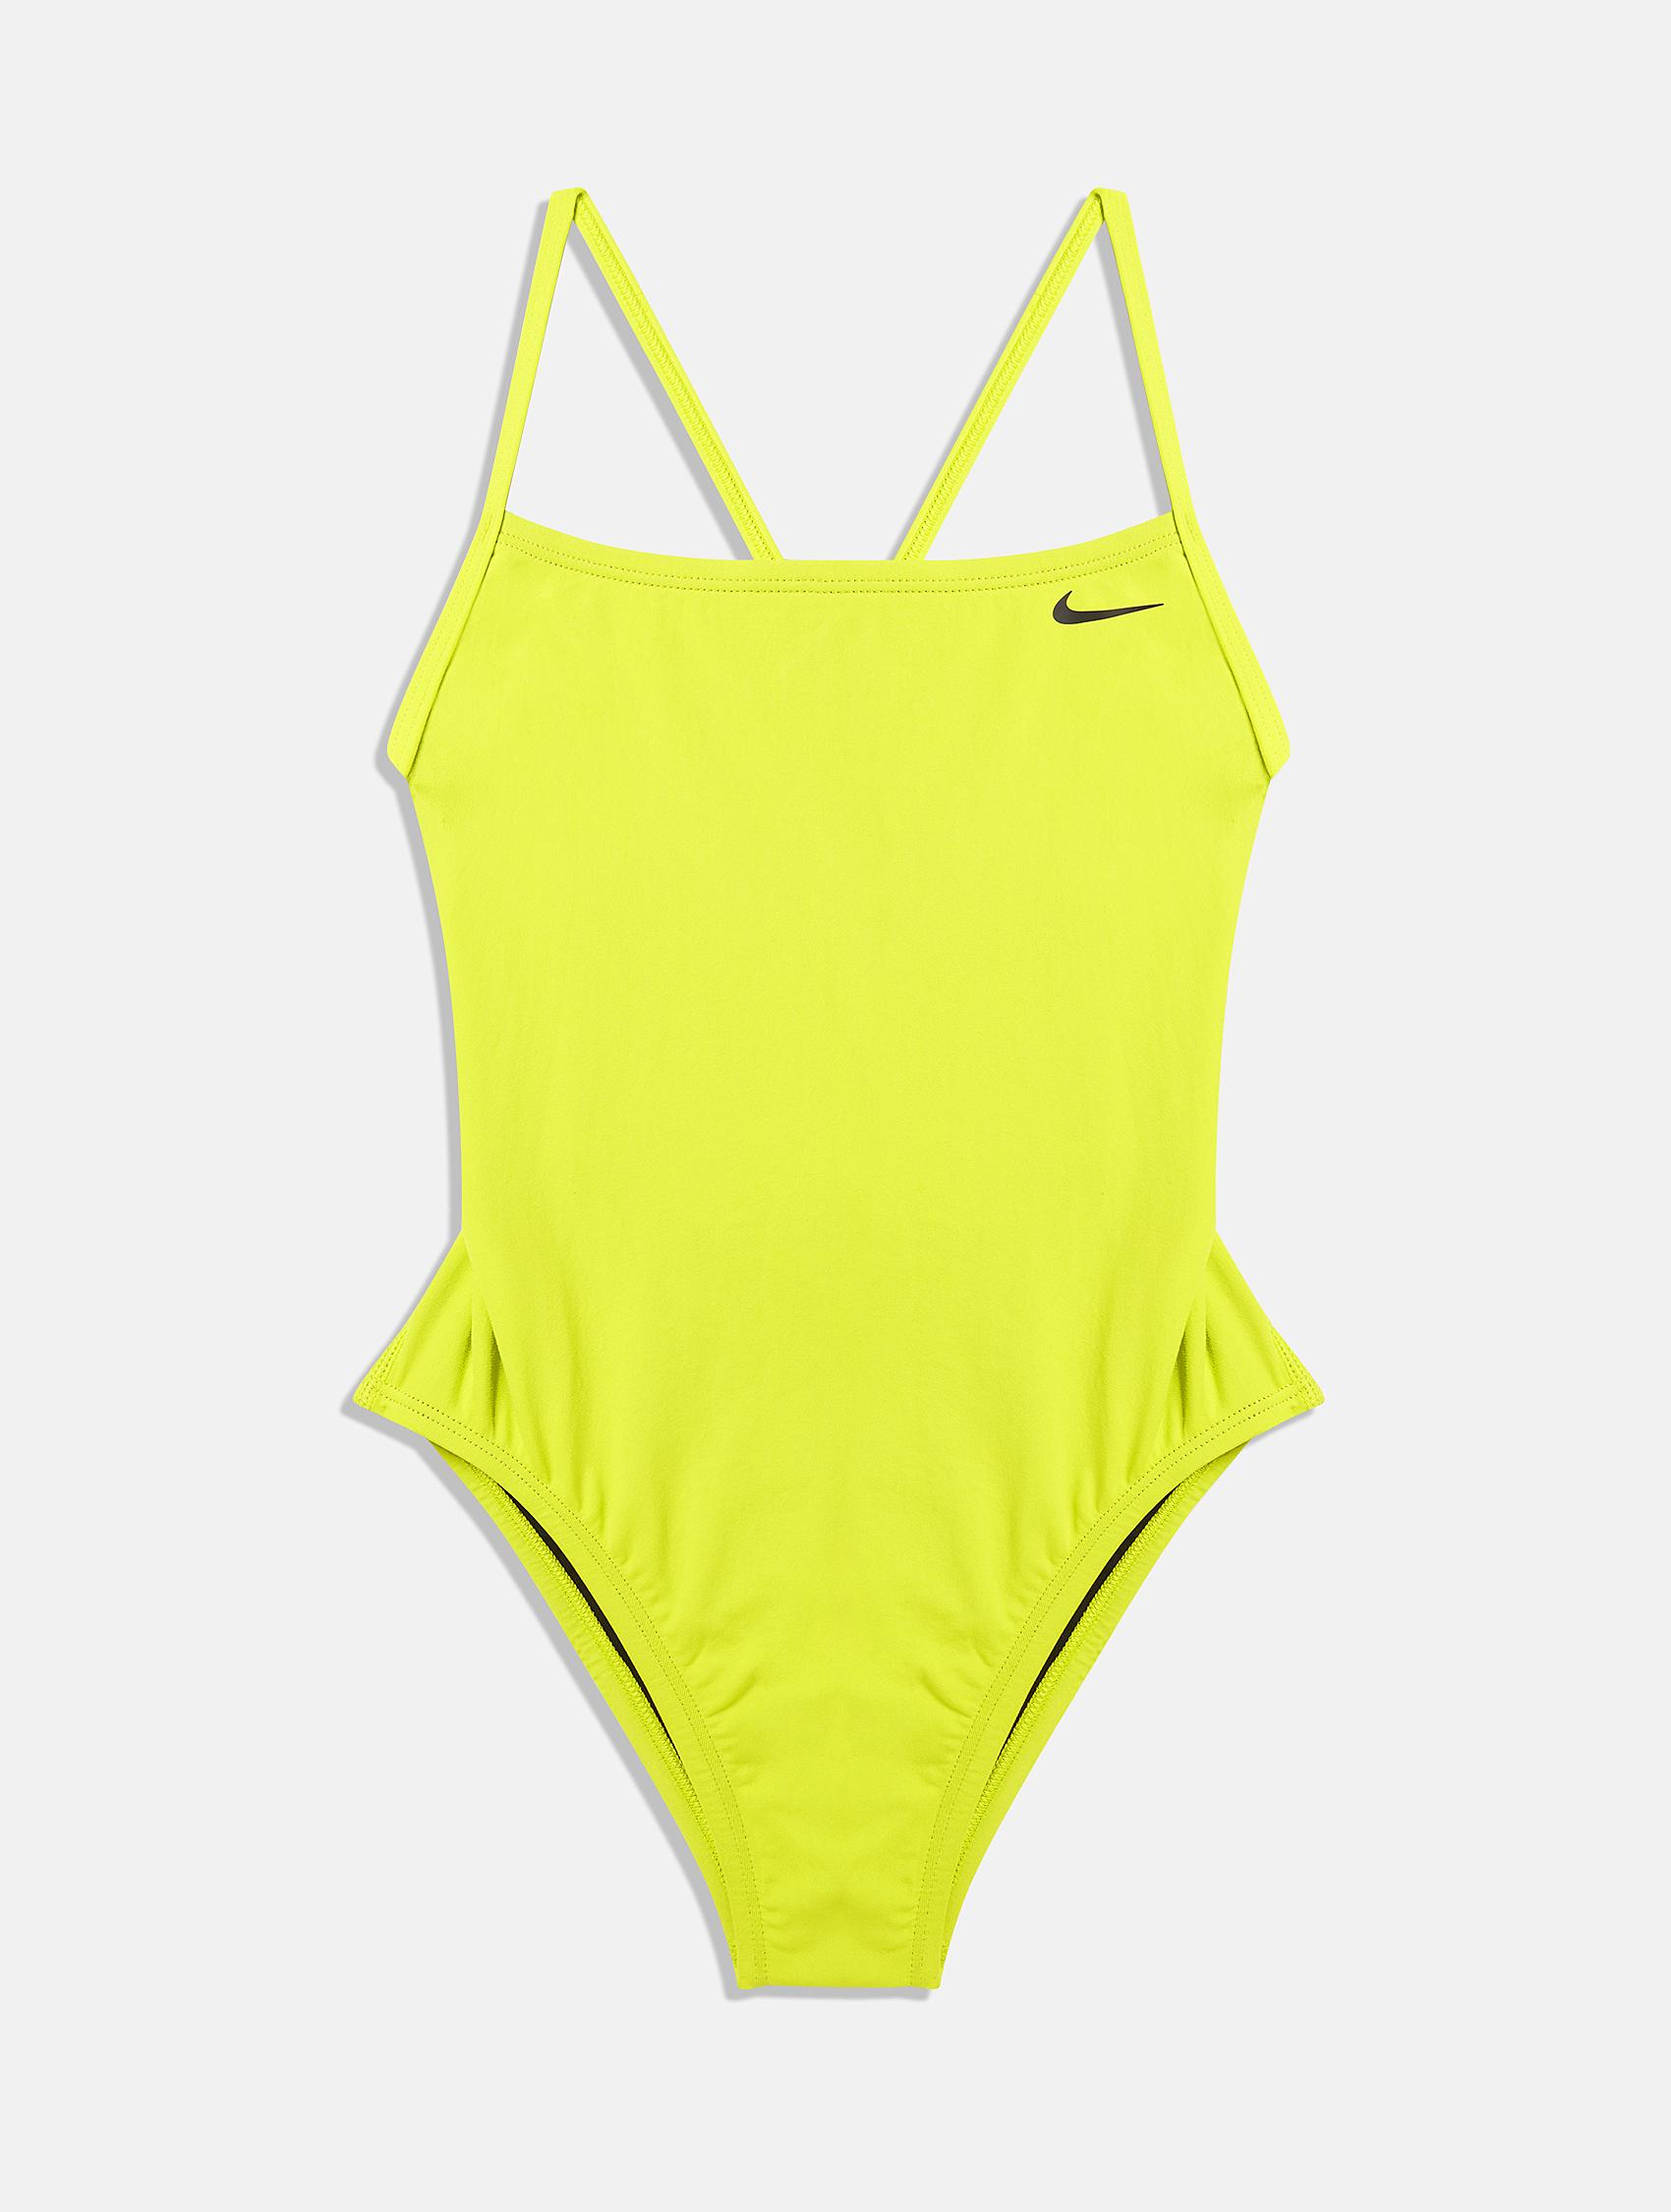 bright yellow Nike swimming bikini , swimwear